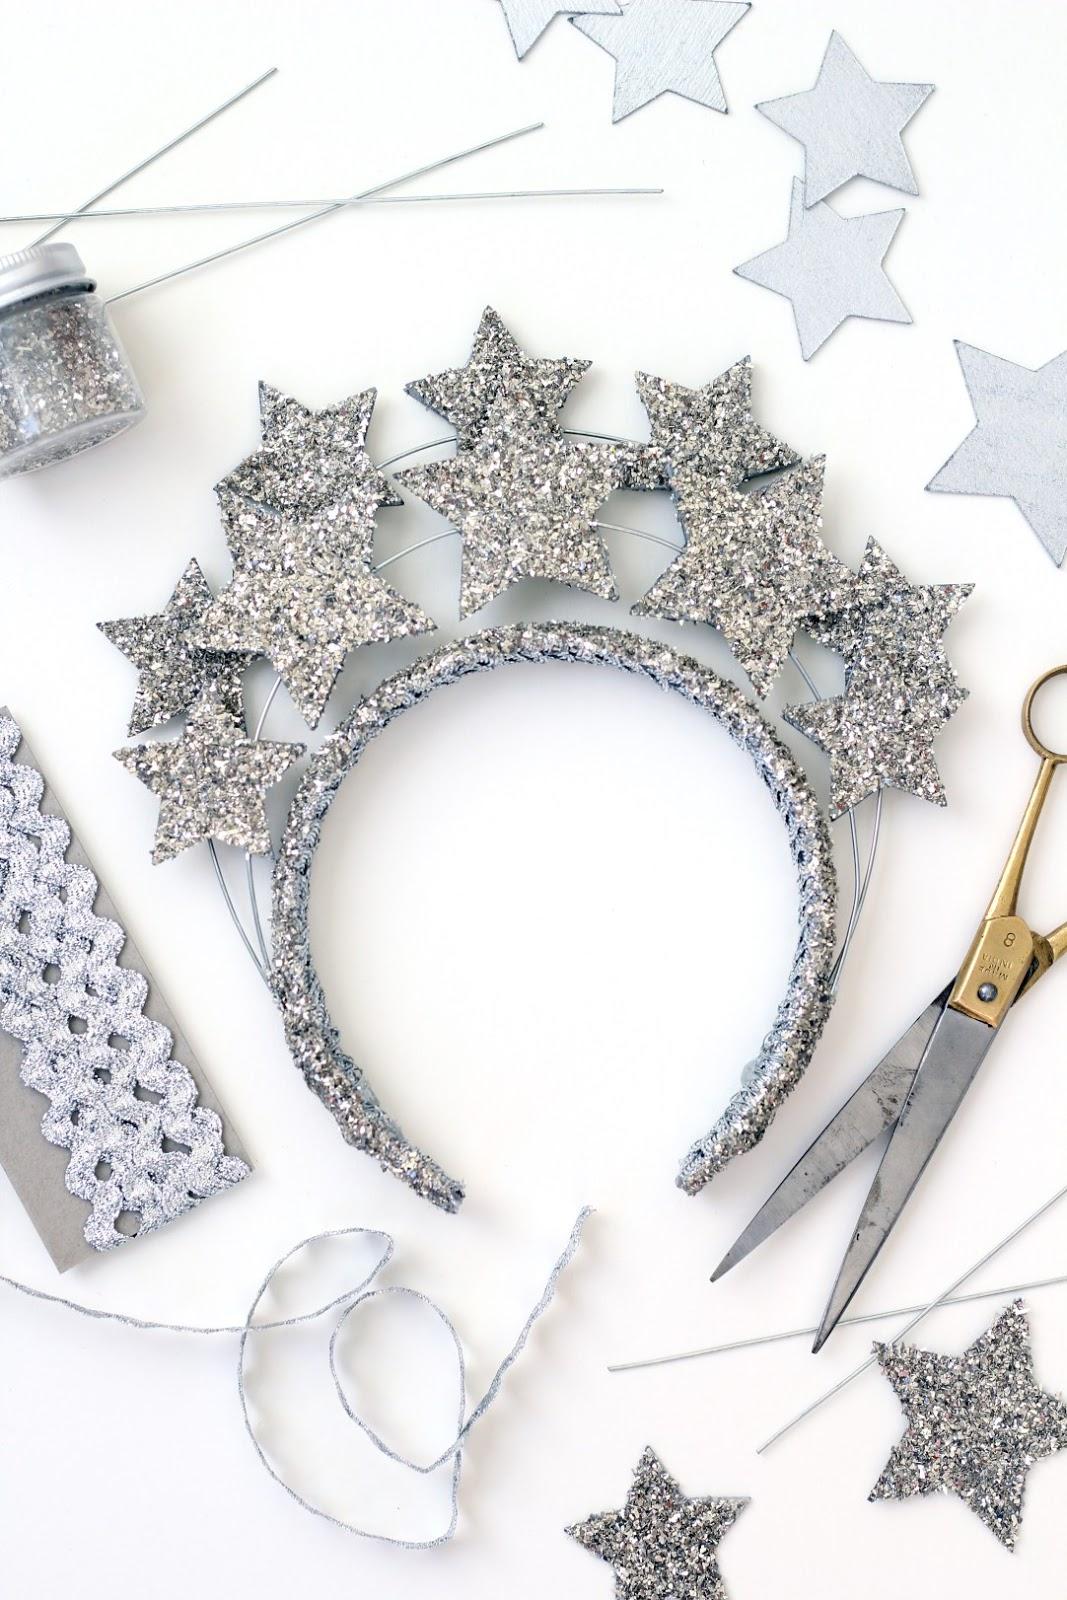 ... http thehousethatlarsbuilt com 2015 12 new years eve star crown html